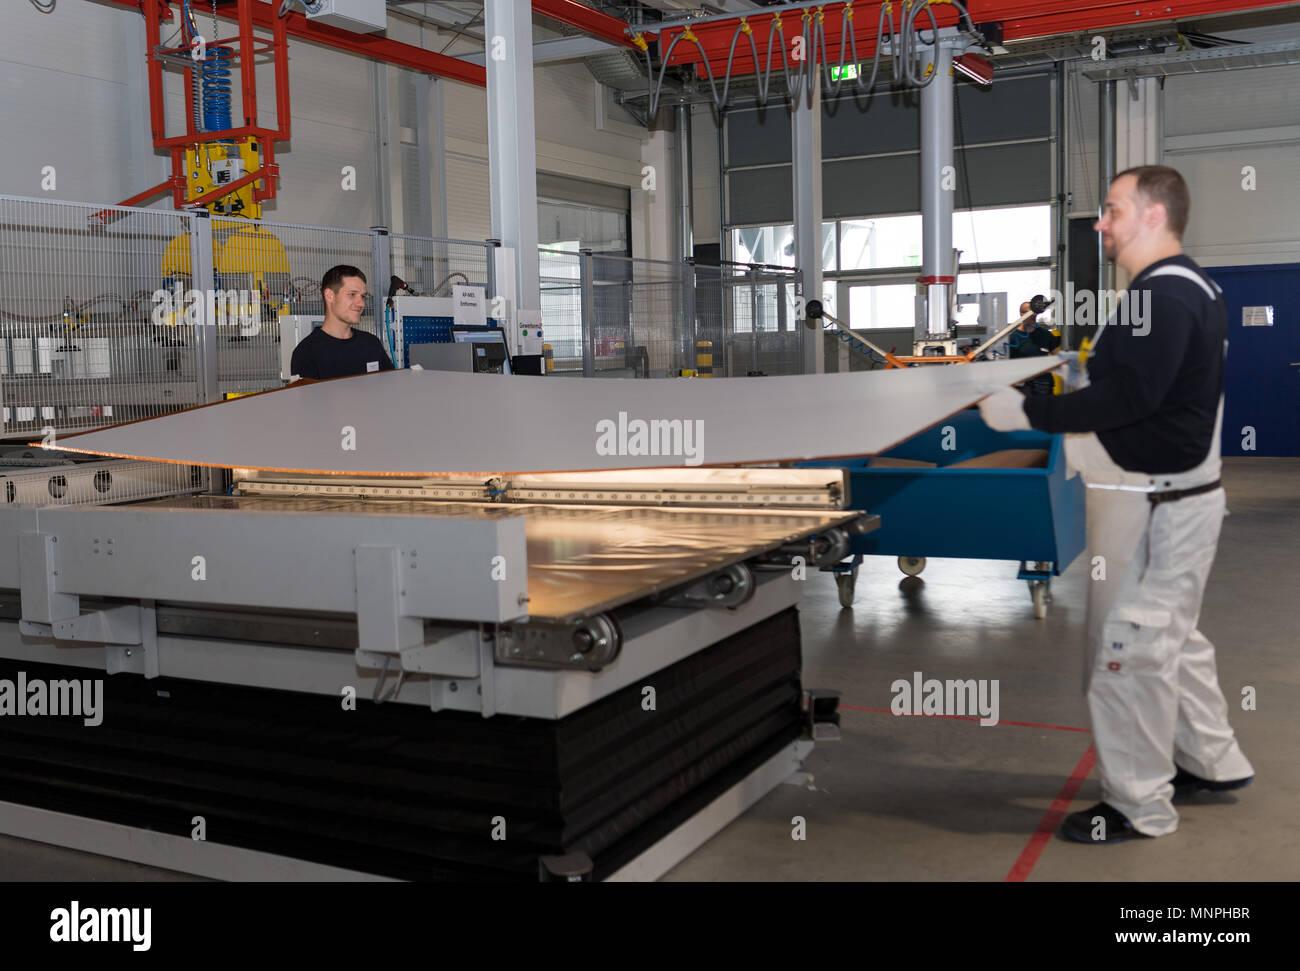 18 May 2018, Germany, Kodersdorf: Raik Proft (R) and Tom